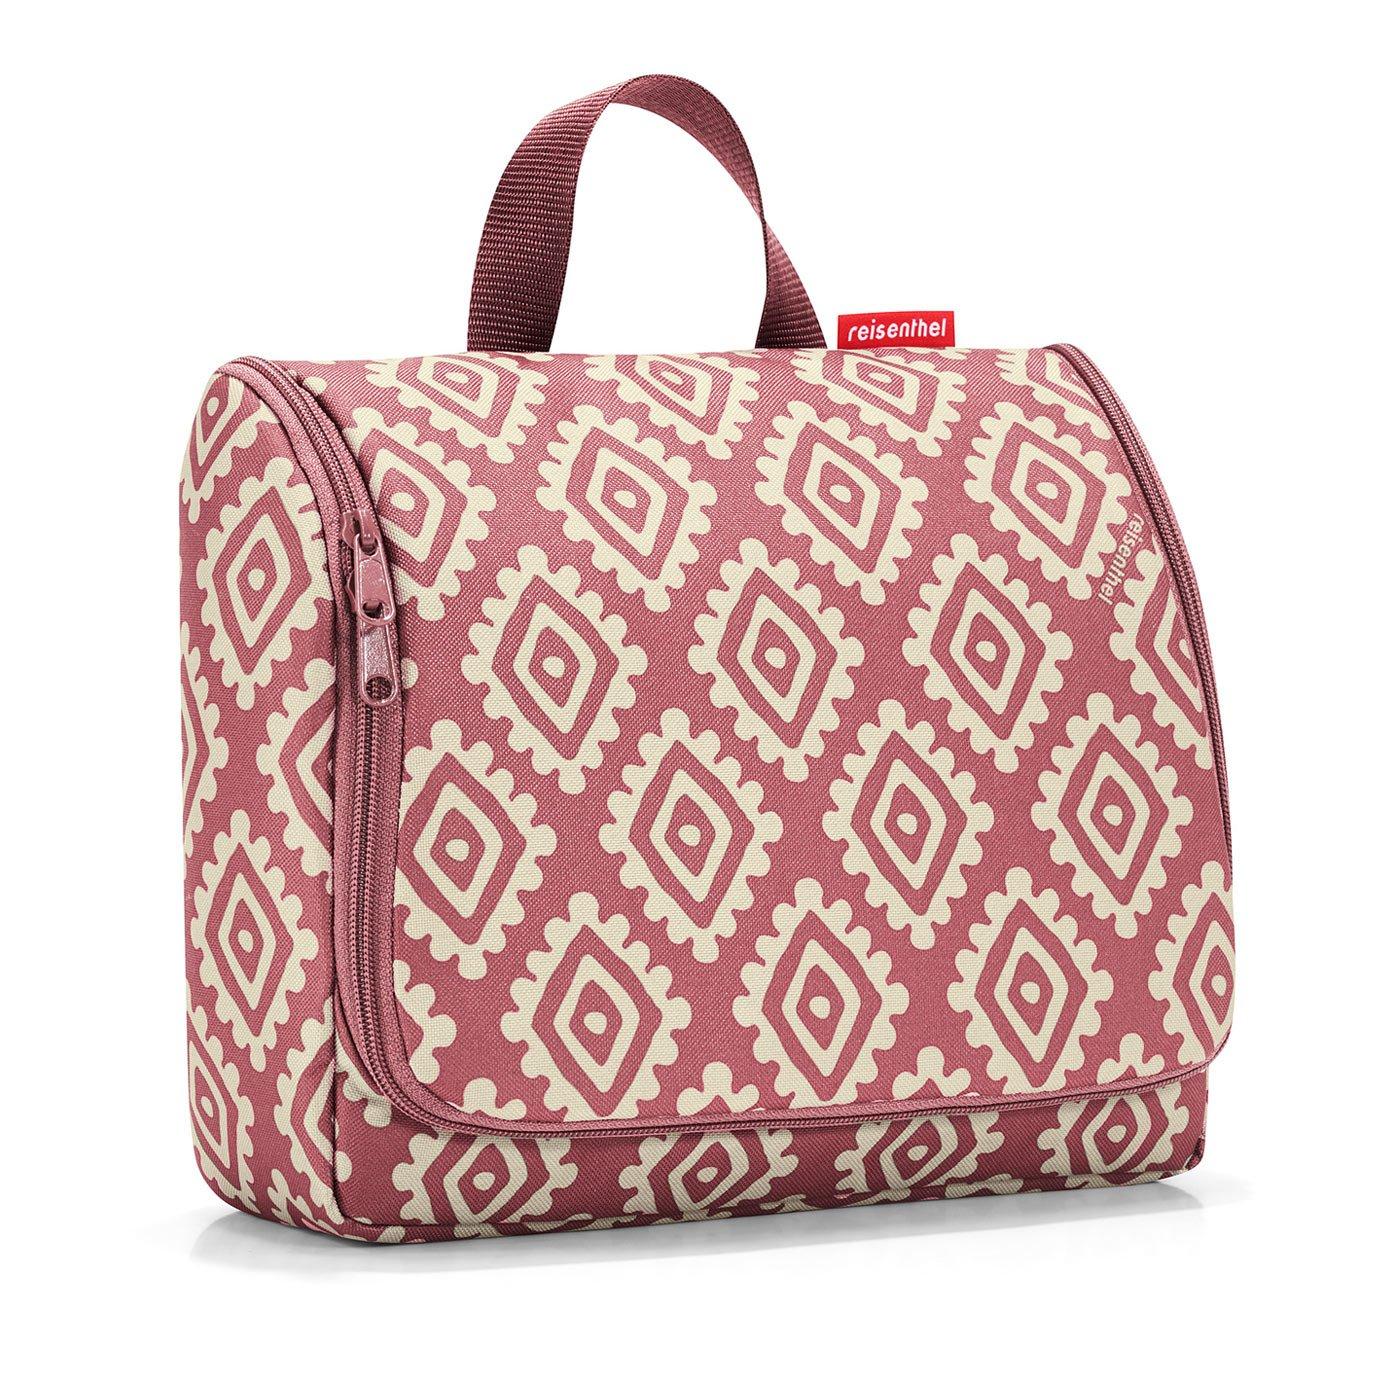 Reisenthel toiletbag XL Beauty Case da viaggio, 28 cm, 4 liters, Marrone (Diamonds Mocha) WO6039